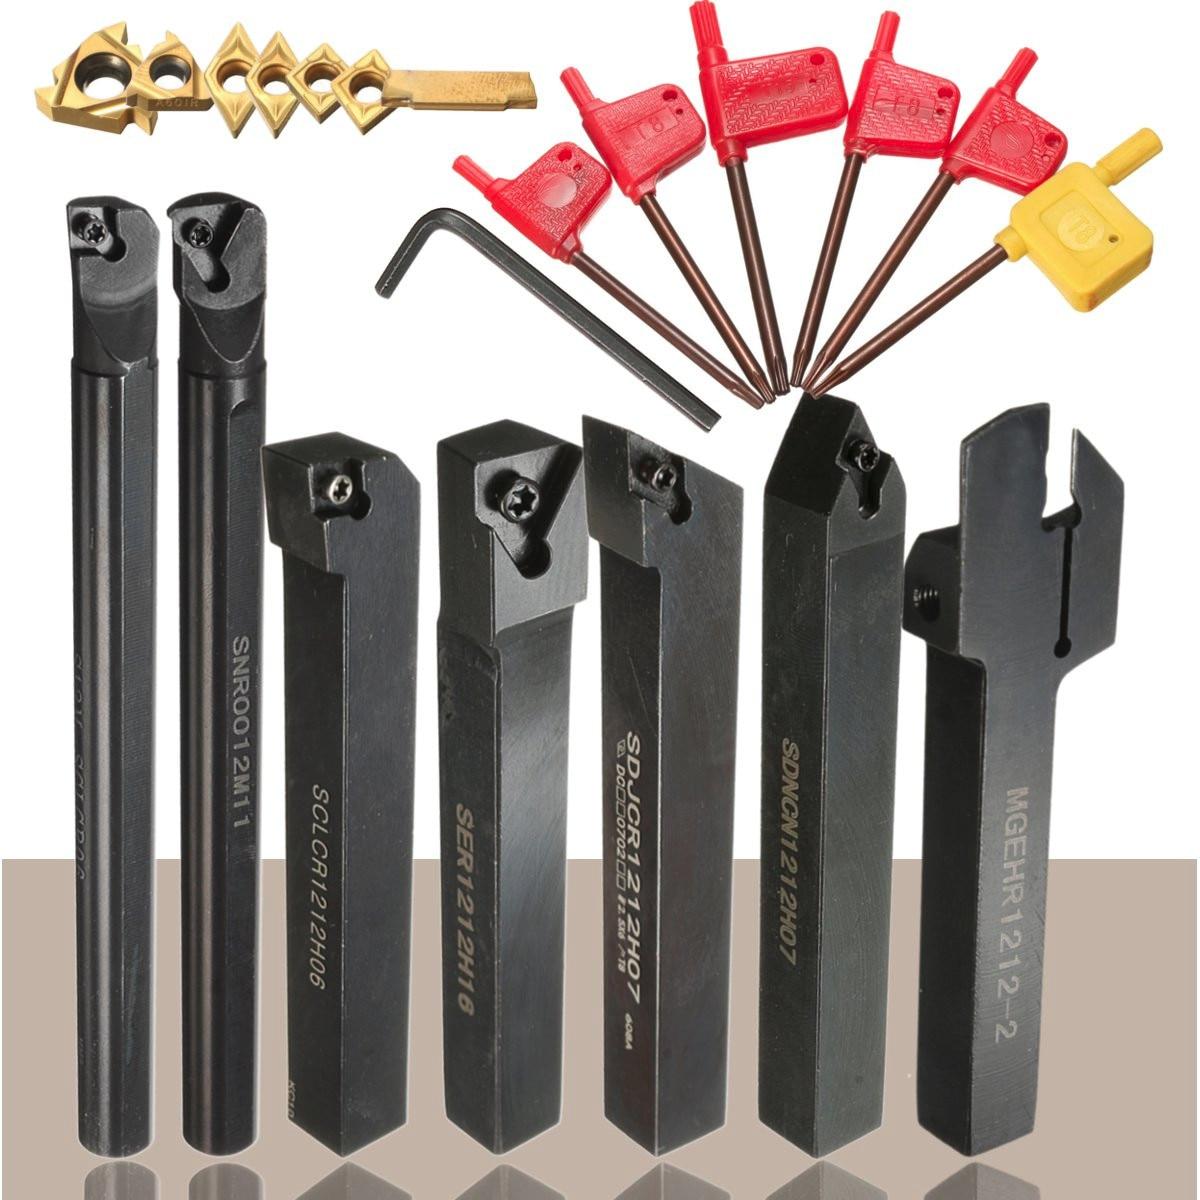 7pcs Turning Tool Holder Set 12mm Shank Lathe Boring Bar With Carbide Inserts + 7pcs Wrenches Tools Set